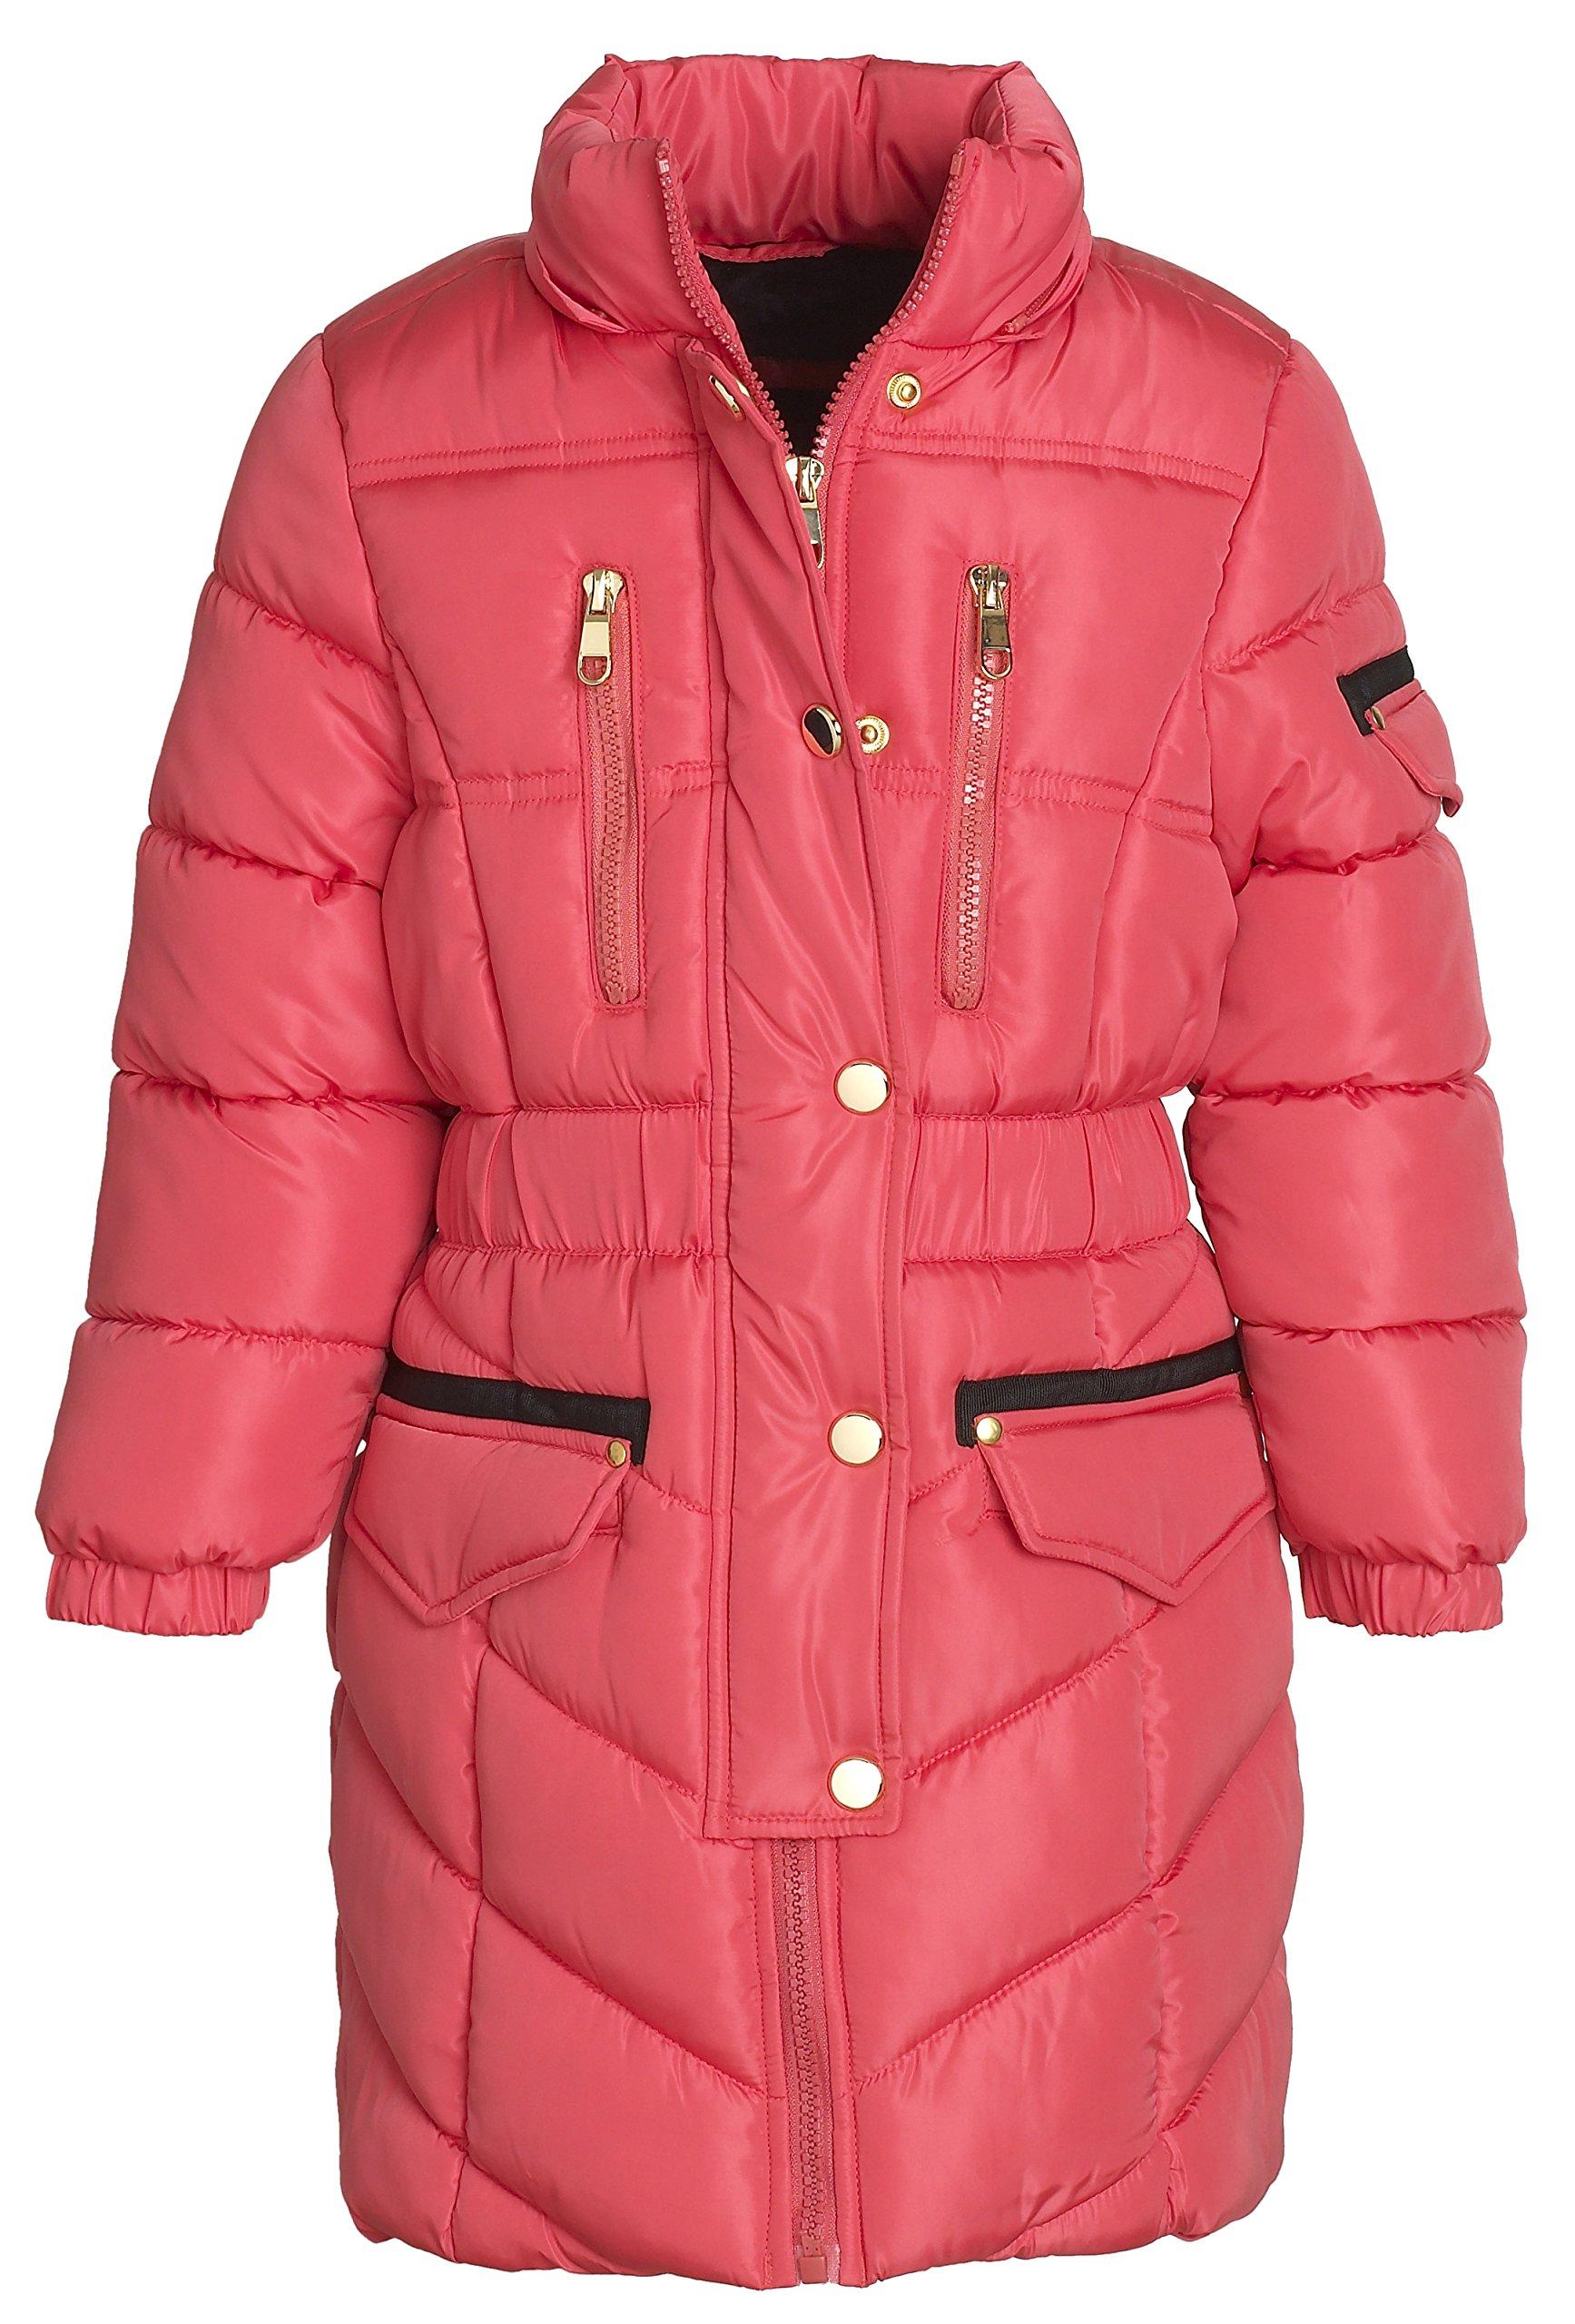 Sportoli Girls' Winter Heavy Quilt Padded Puffer Jacket Plush Lined Hooded Coat (Hibiscus, 7/8) by Sportoli (Image #3)